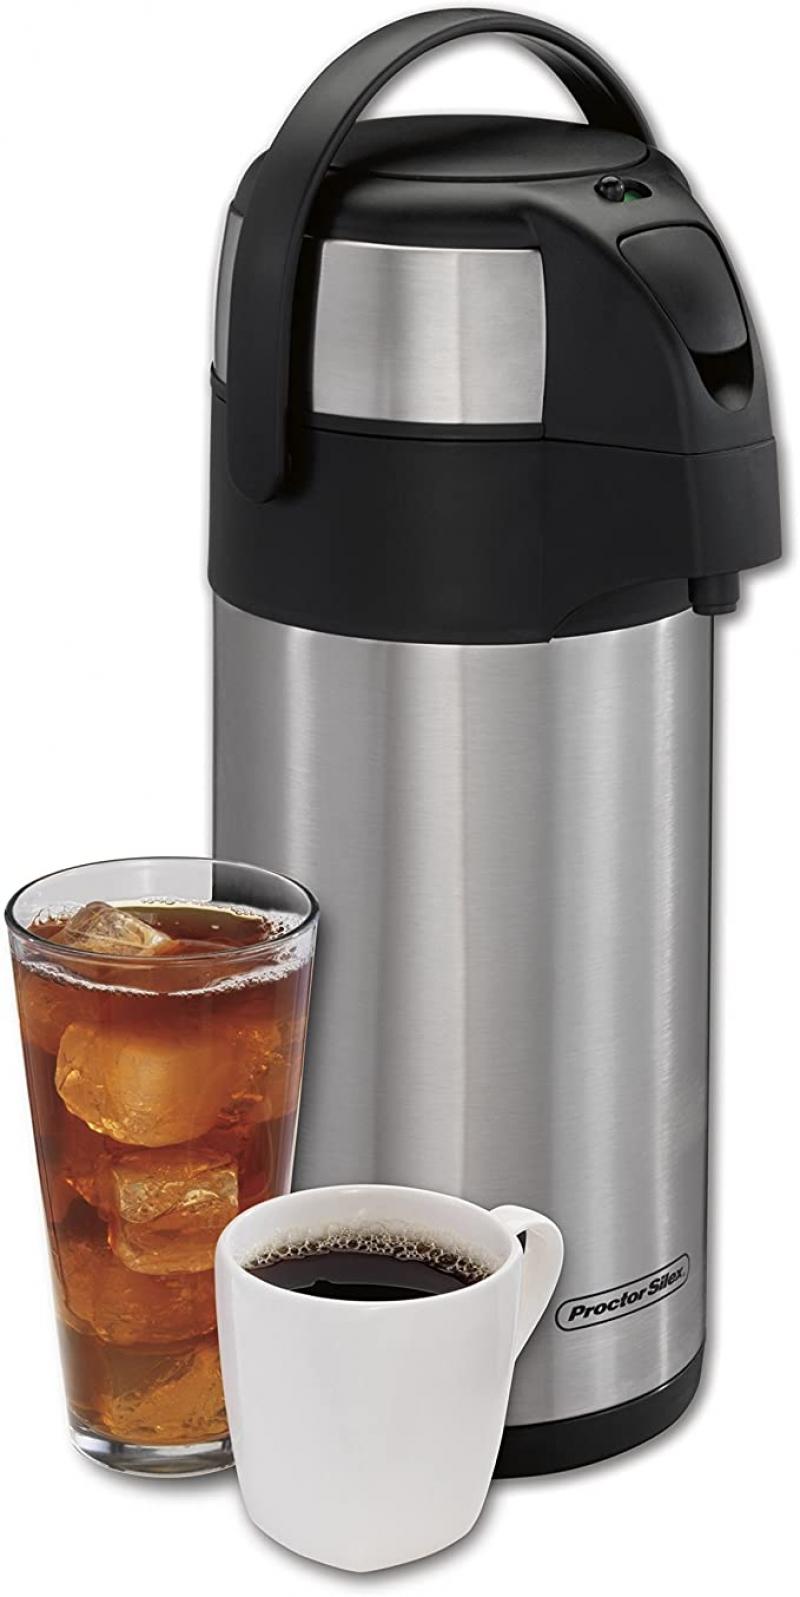 ihocon: Proctor Silex 3 Liter Airpot Hot Coffee Beverage Dispenser with Pump 按壓式飲料保温瓶(保熱12小時, 保冷24小時)